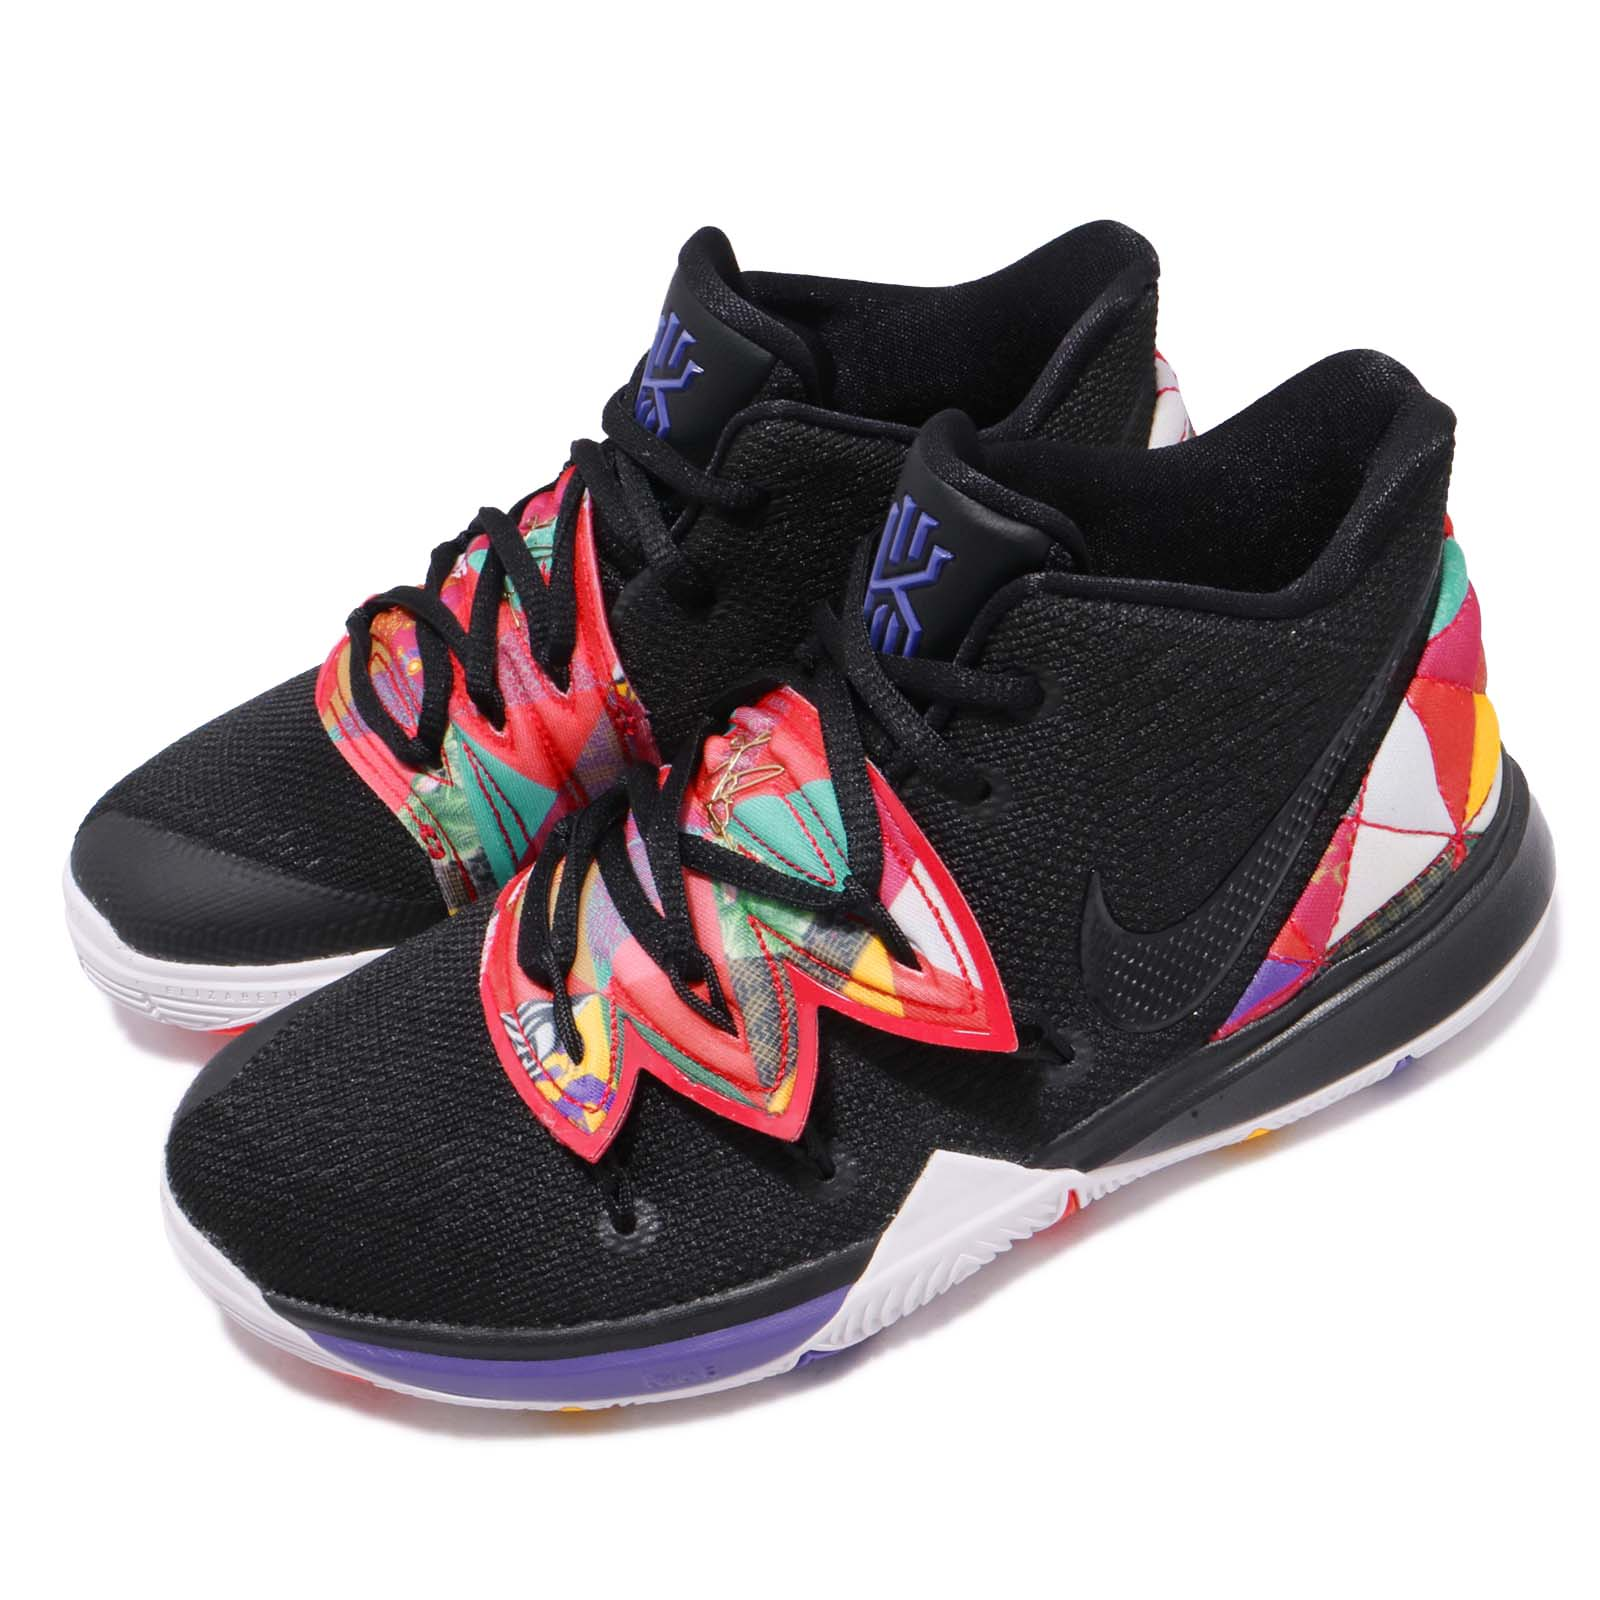 Nike 籃球鞋 Kyrie 5 GS CNY 女鞋 AQ2456-010